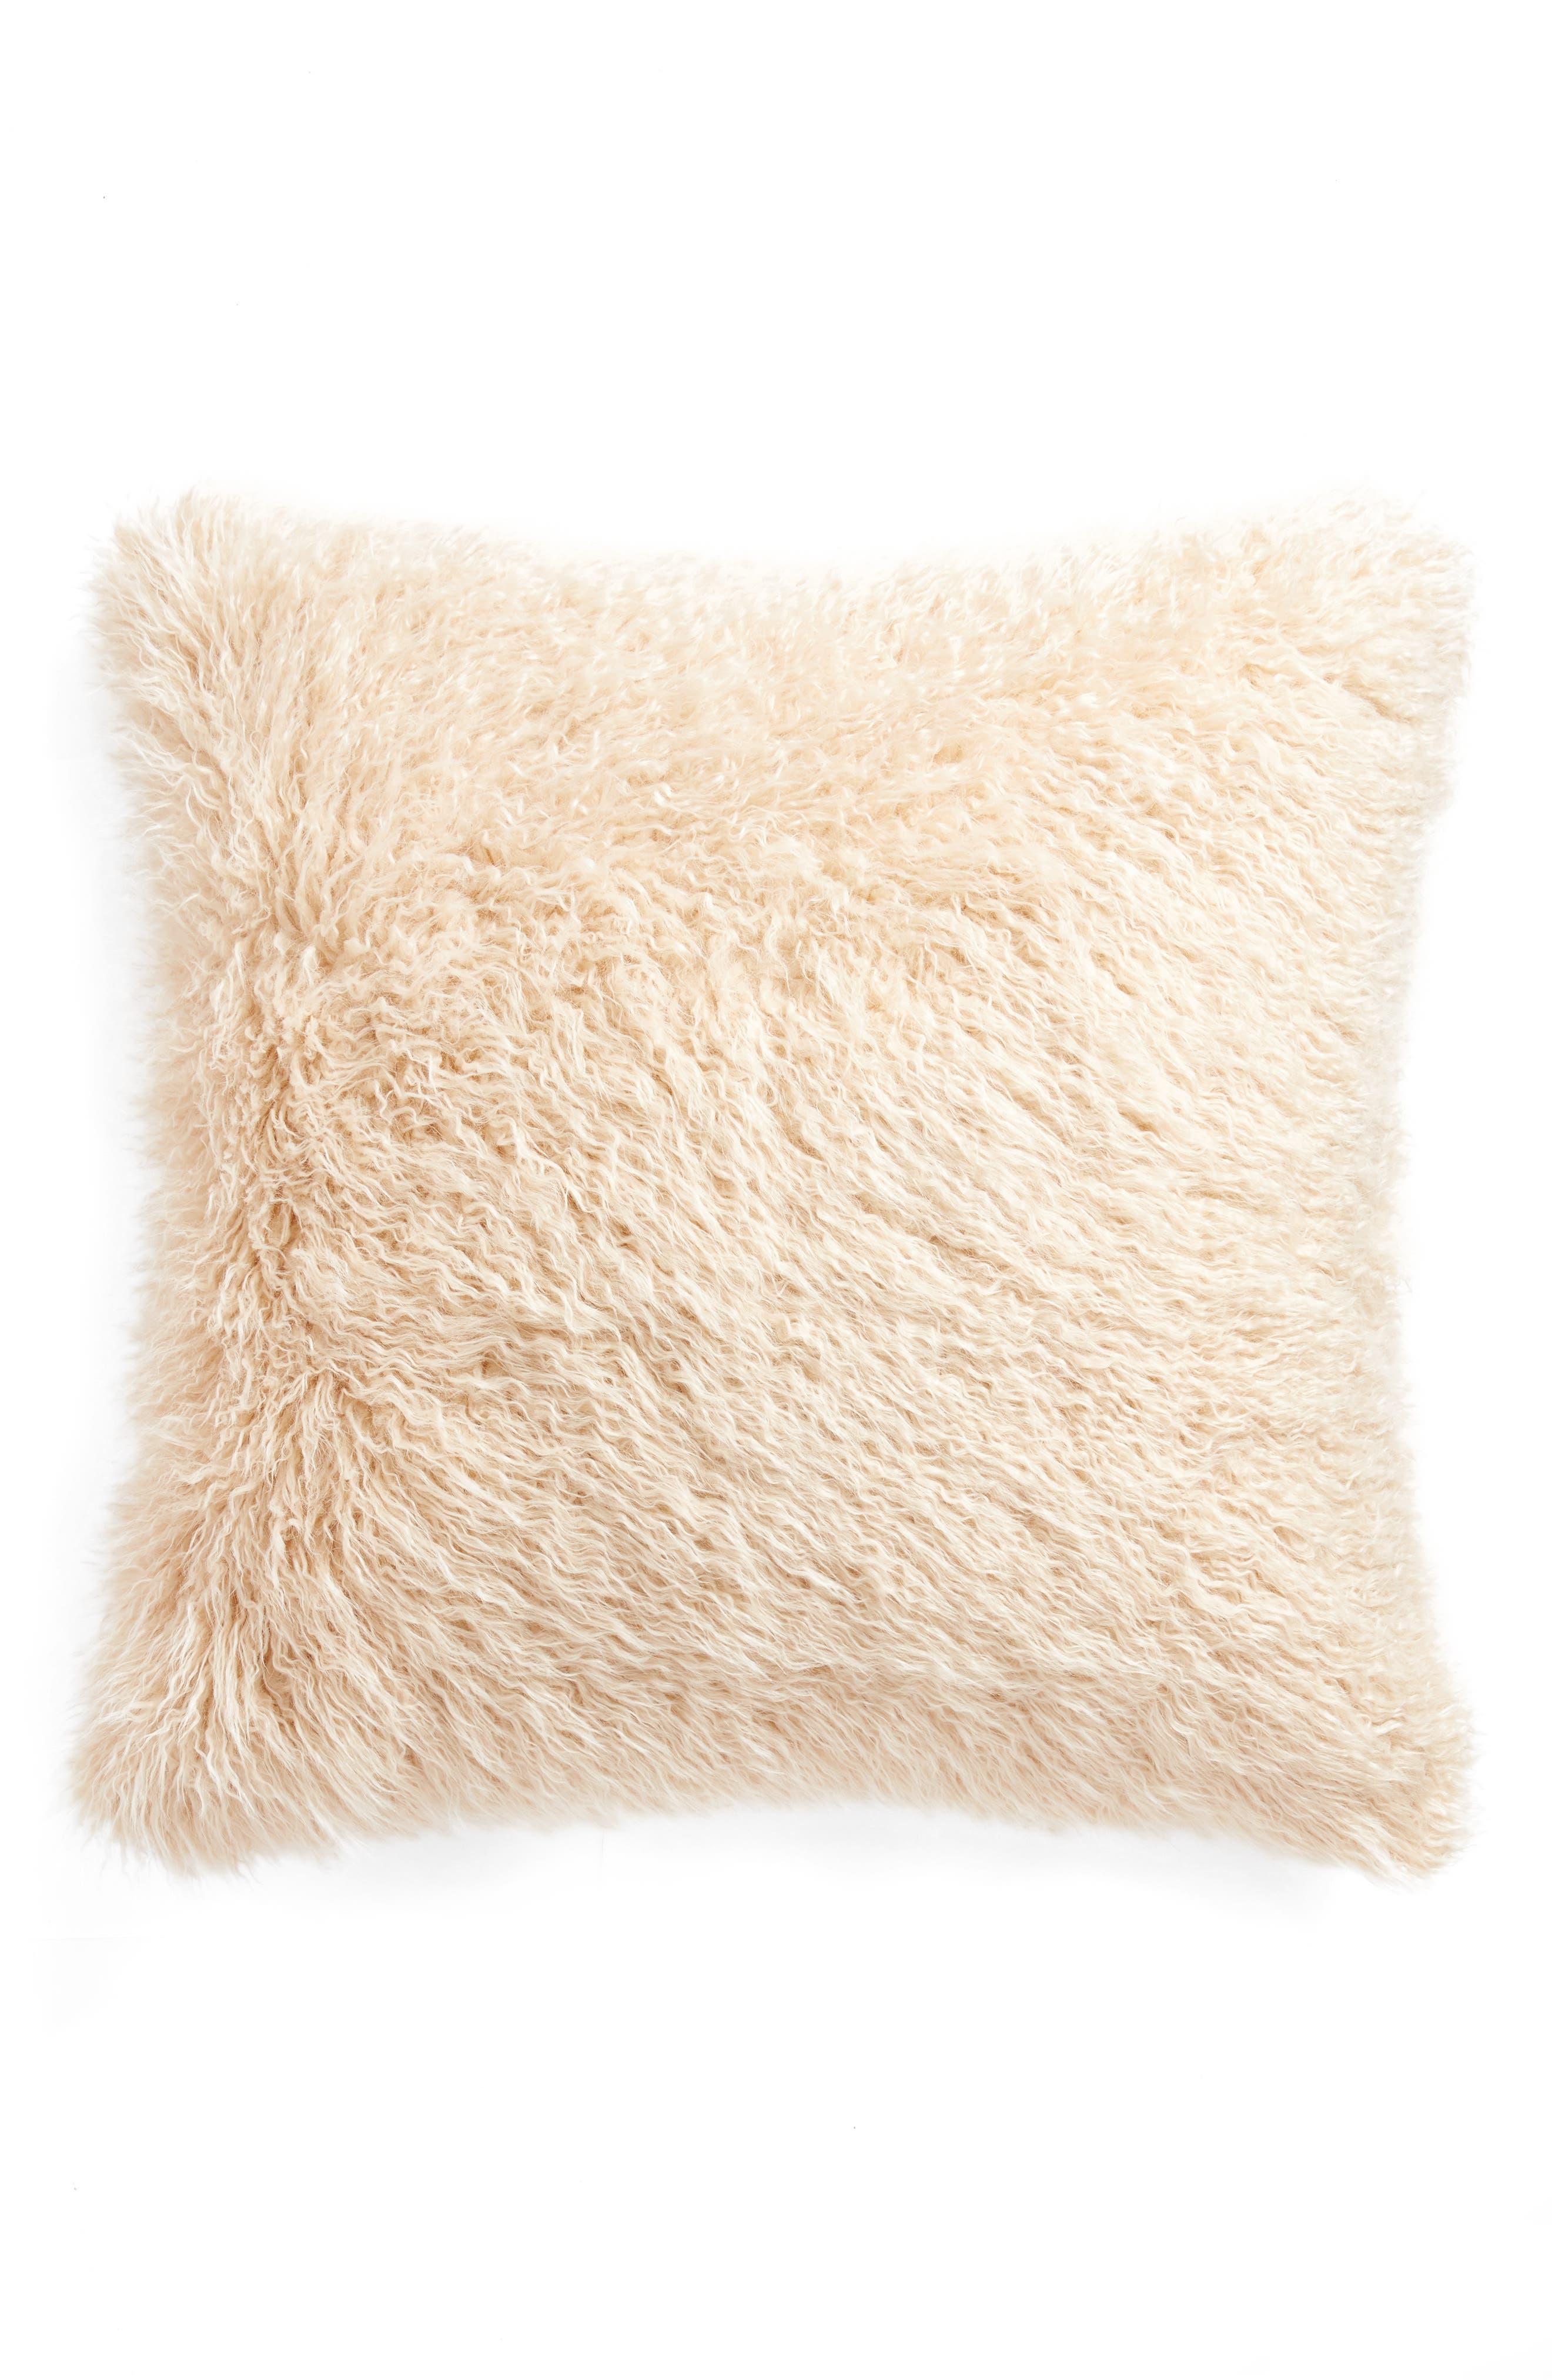 TREASURE & BOND,                             Curly Faux Fur Pillow,                             Main thumbnail 1, color,                             BEIGE BEACH